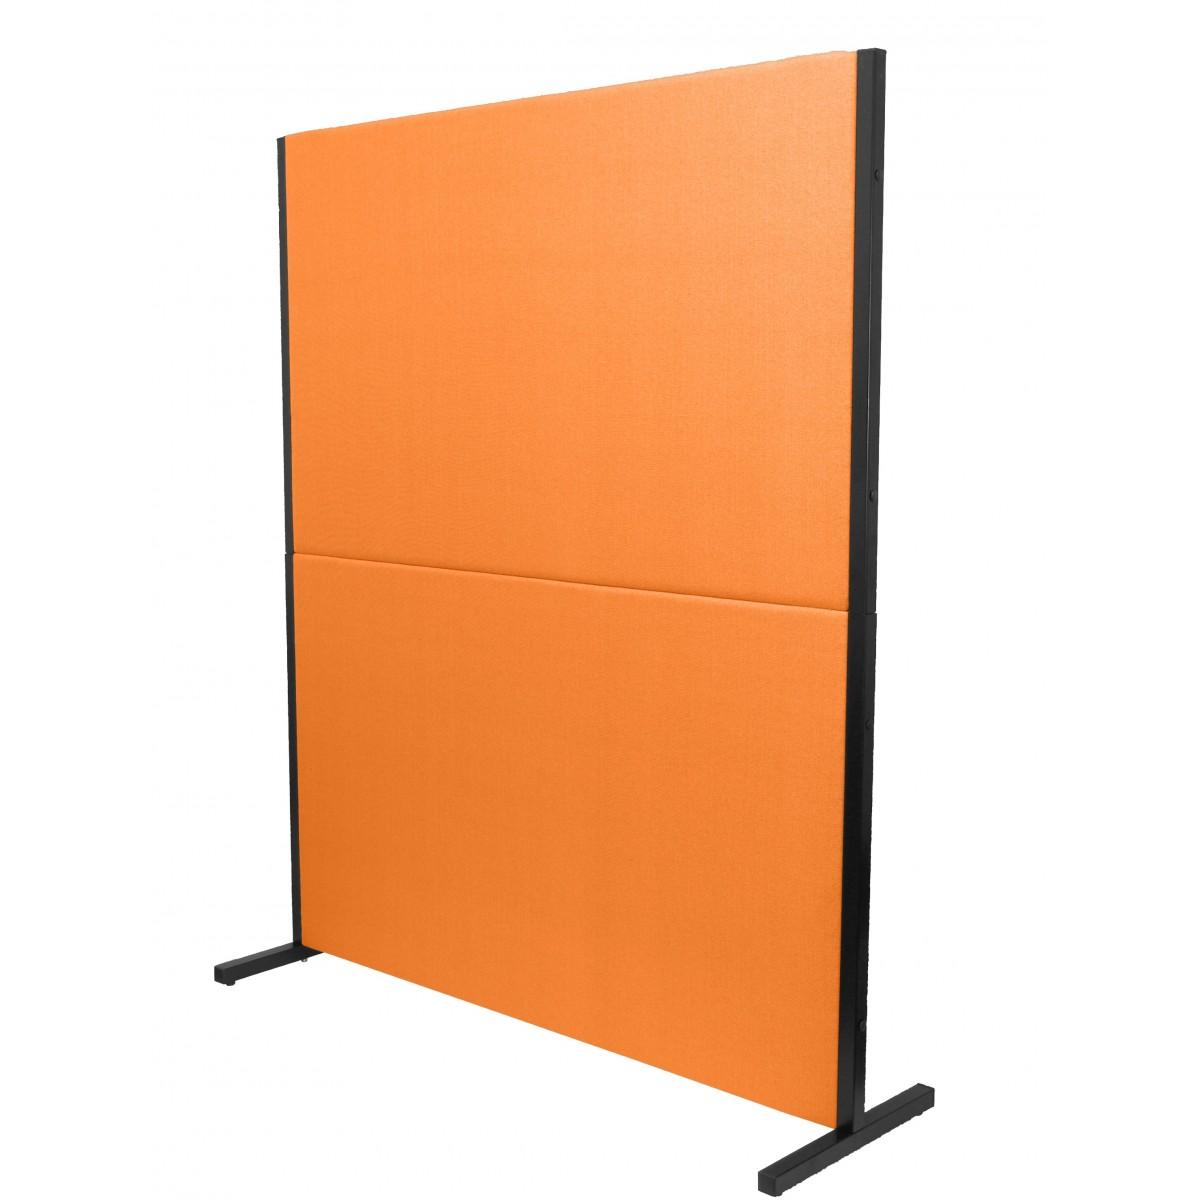 biombo acustico textil naranja